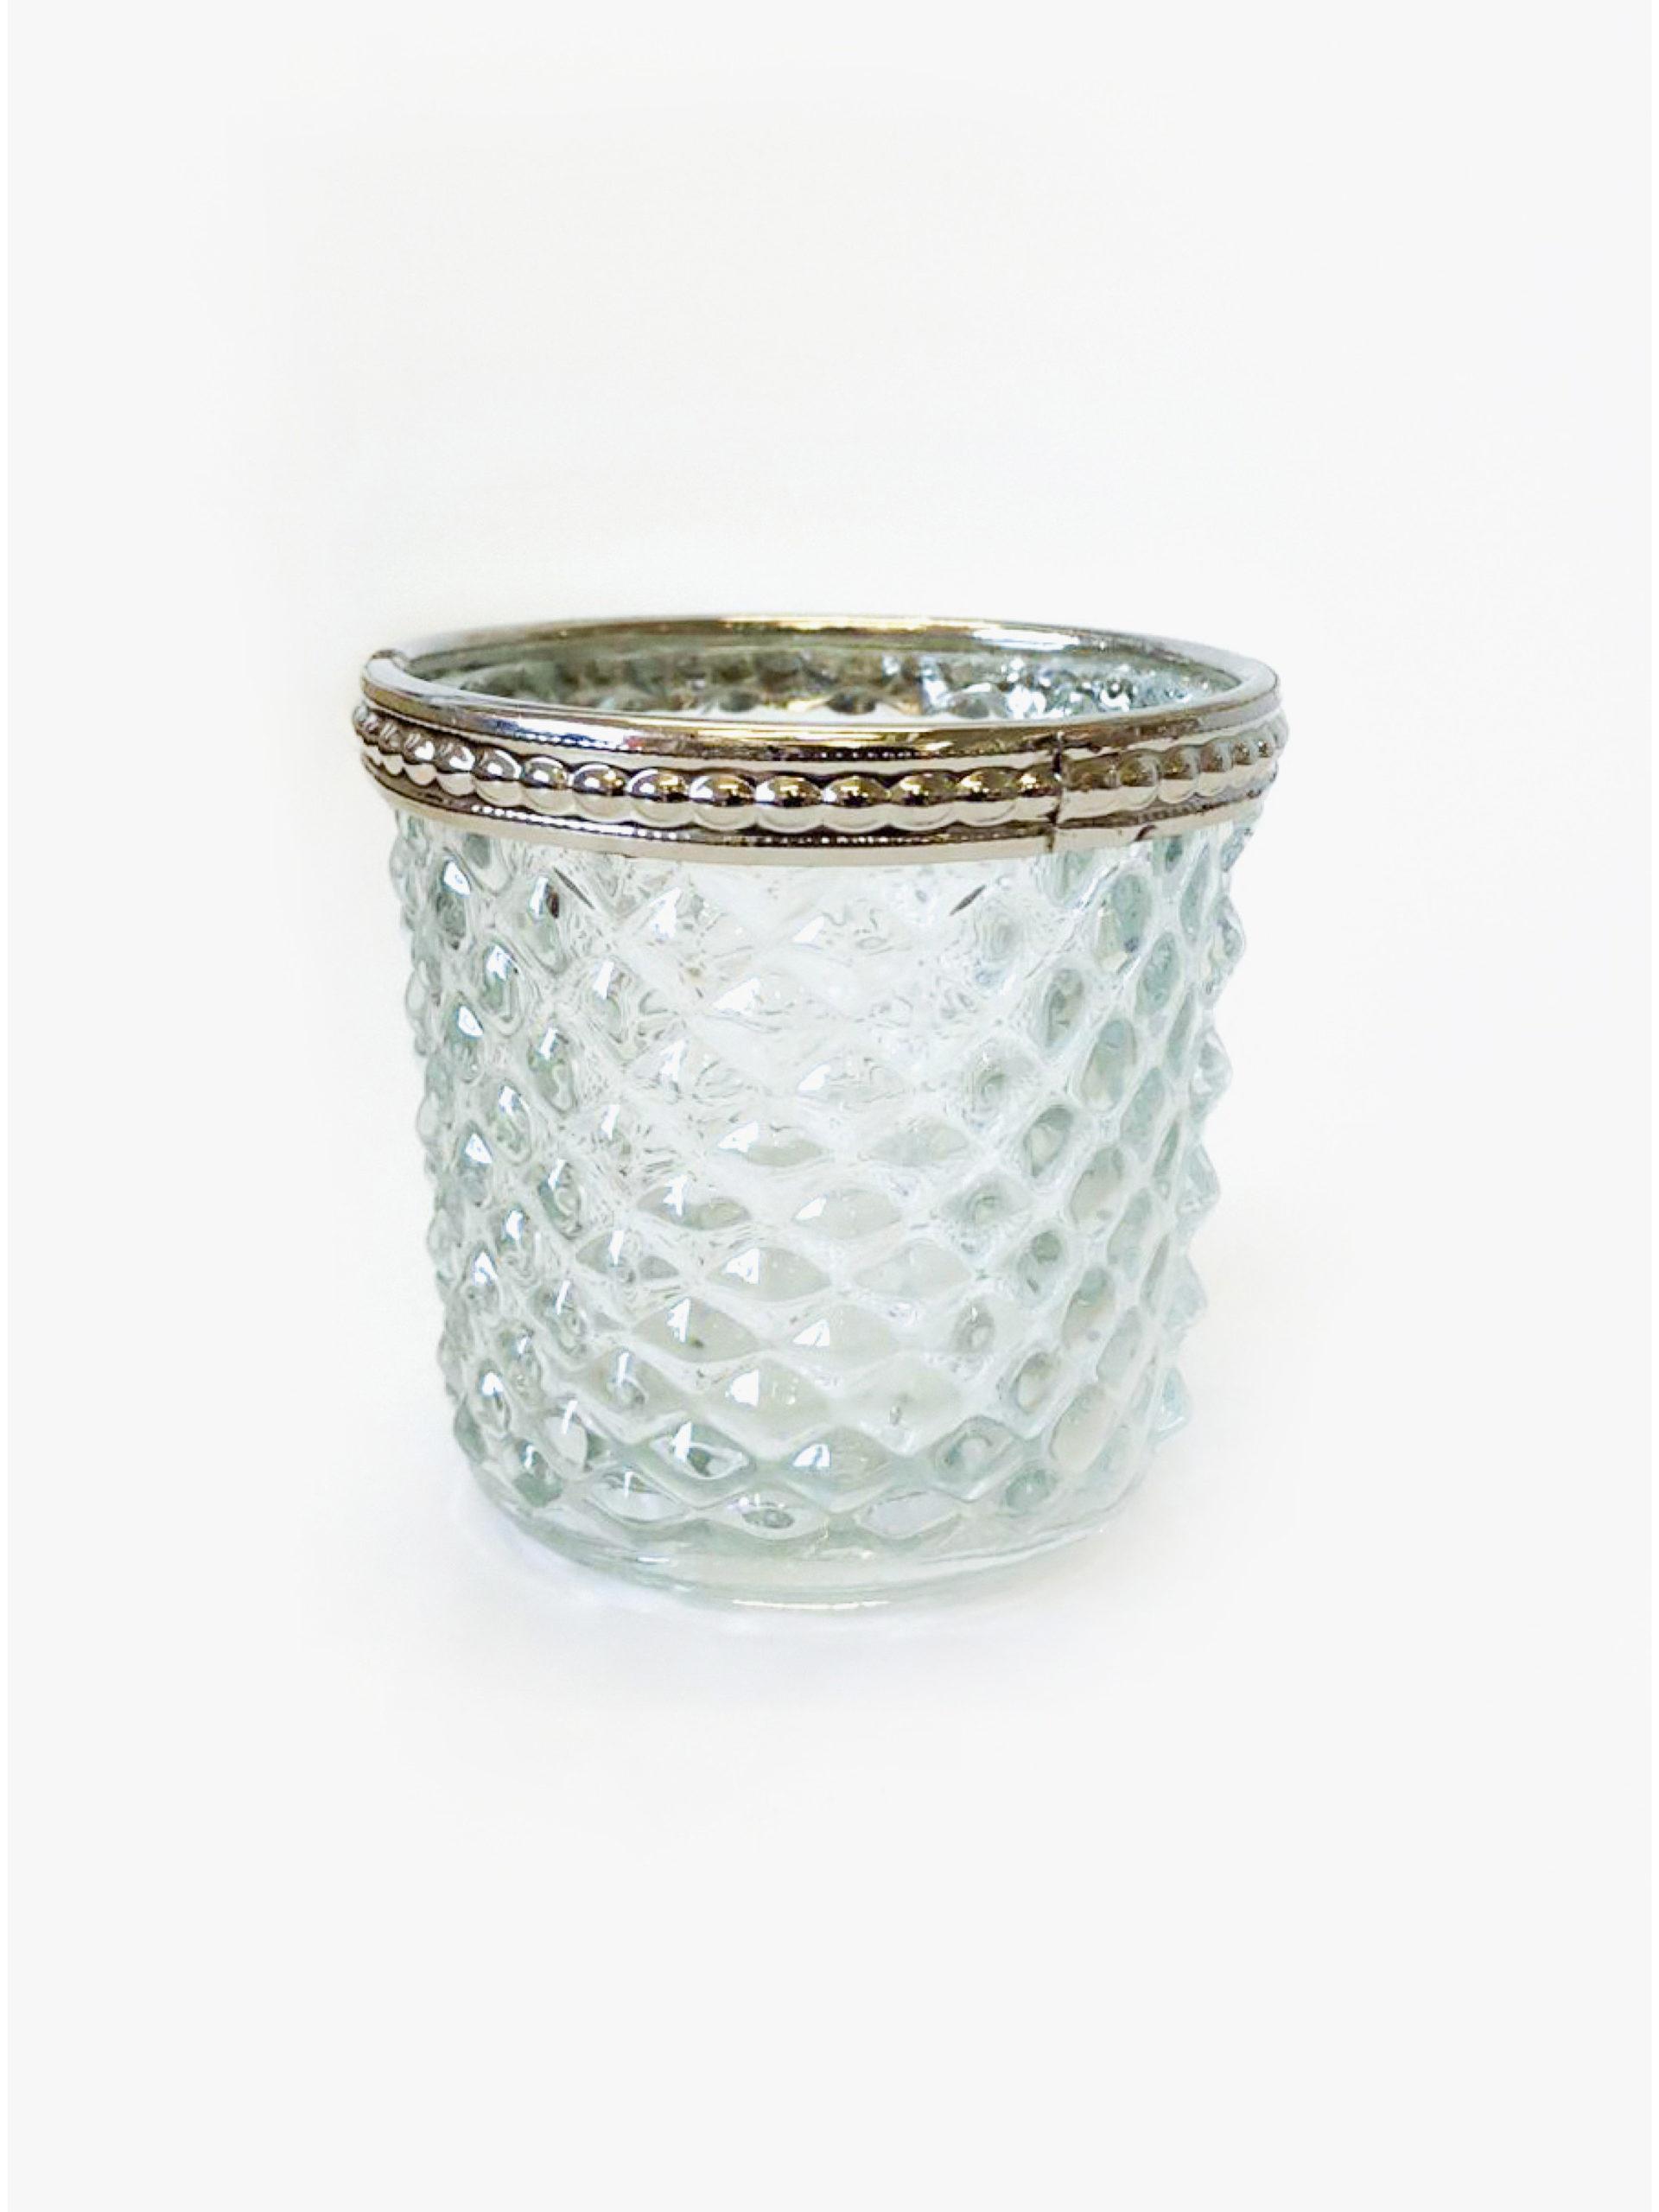 Hélène Millot - Glass and Silver - Small